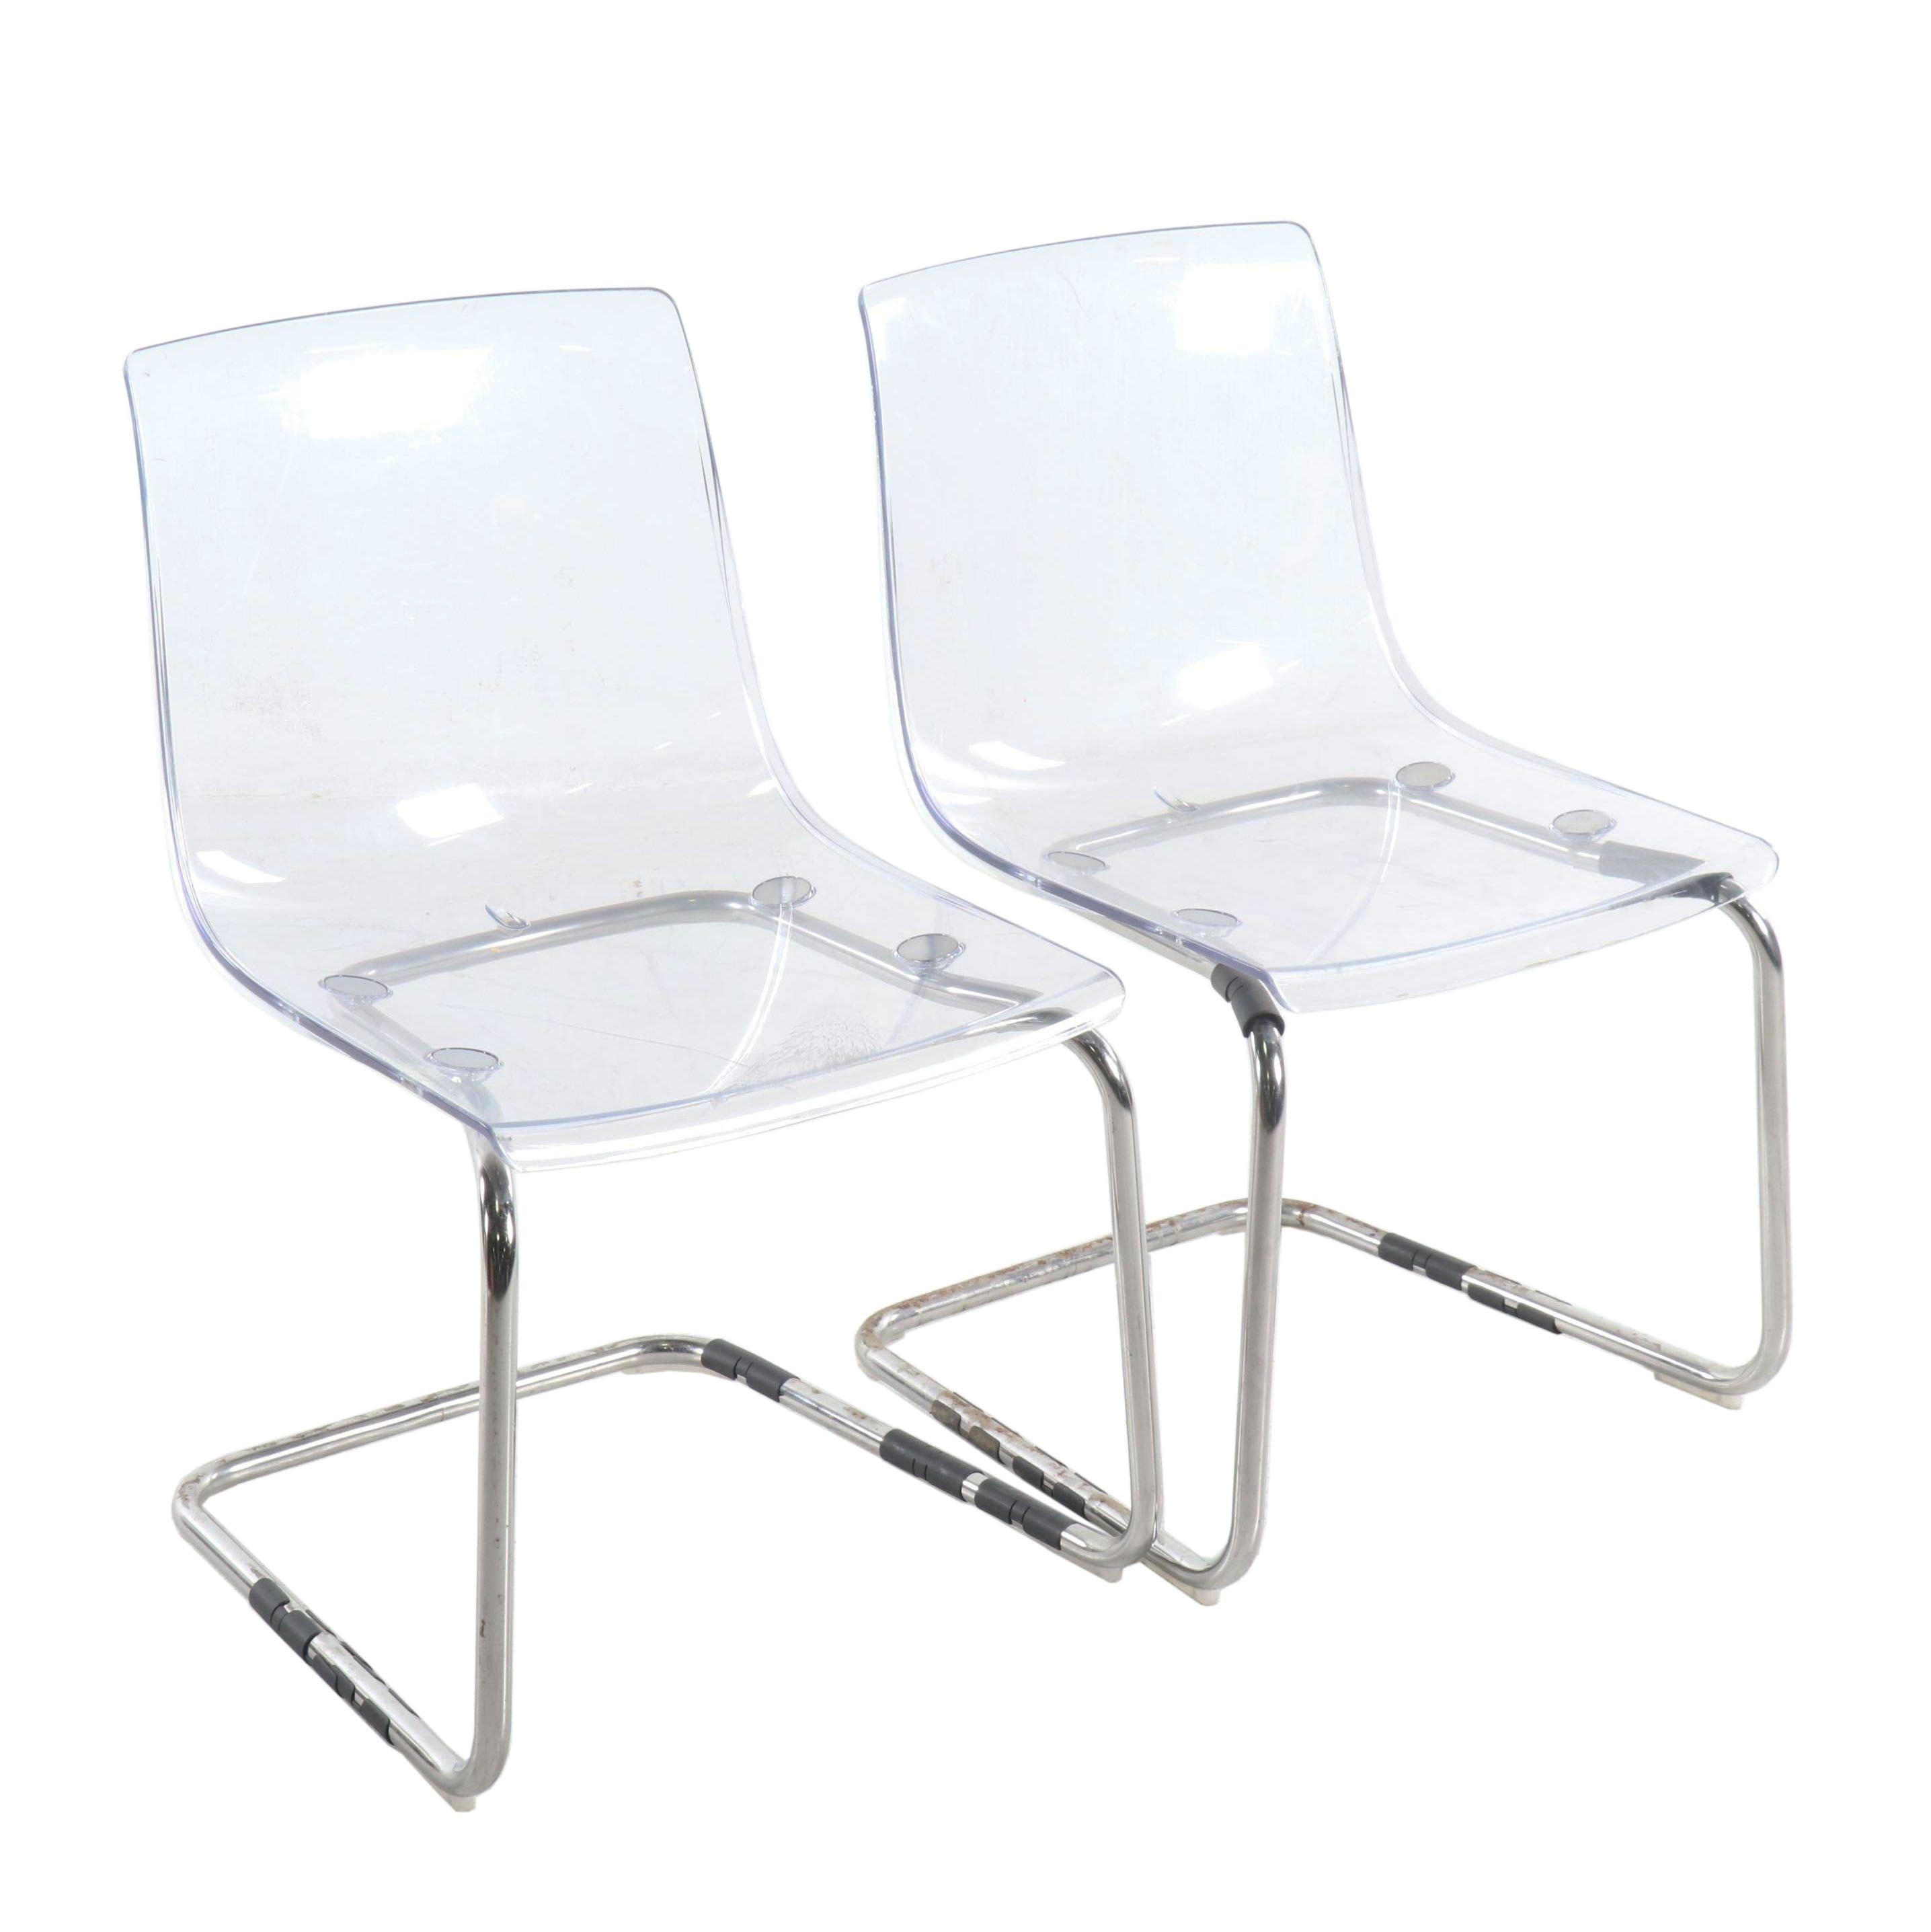 "Acrylic ""Tobias"" Side Chairs by IKEA"